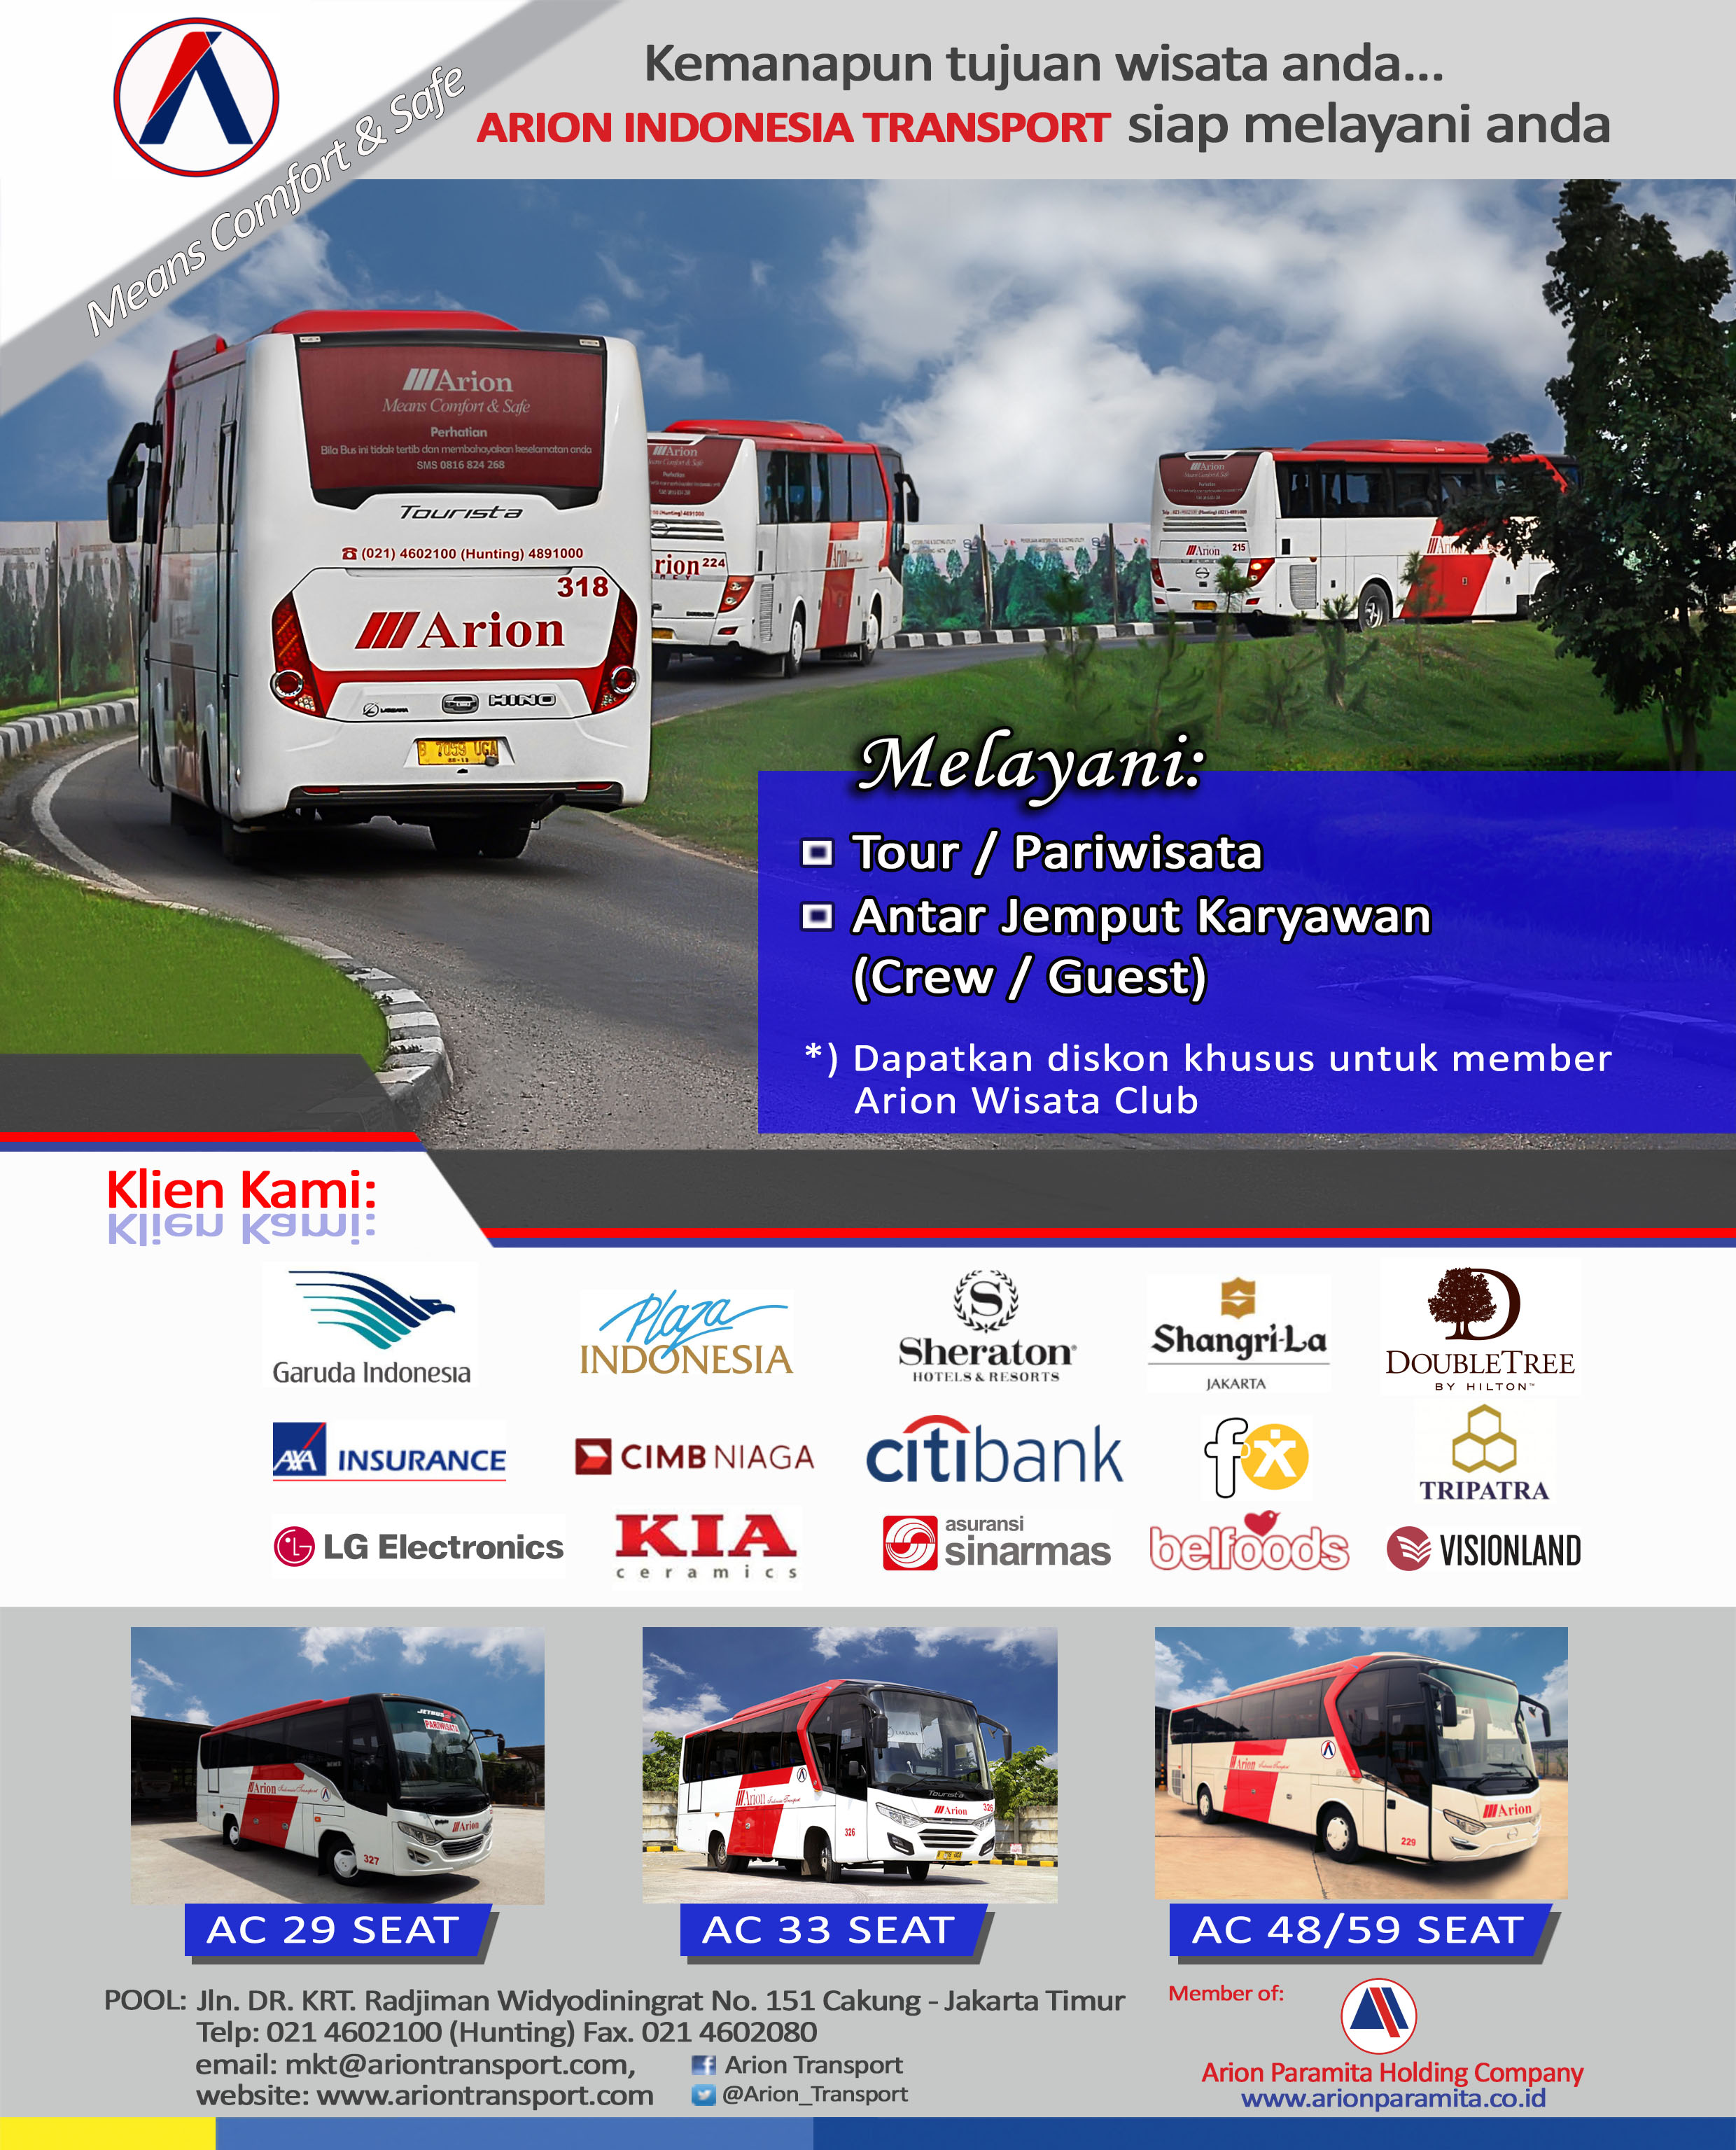 bus-antar-jemput-karyawan